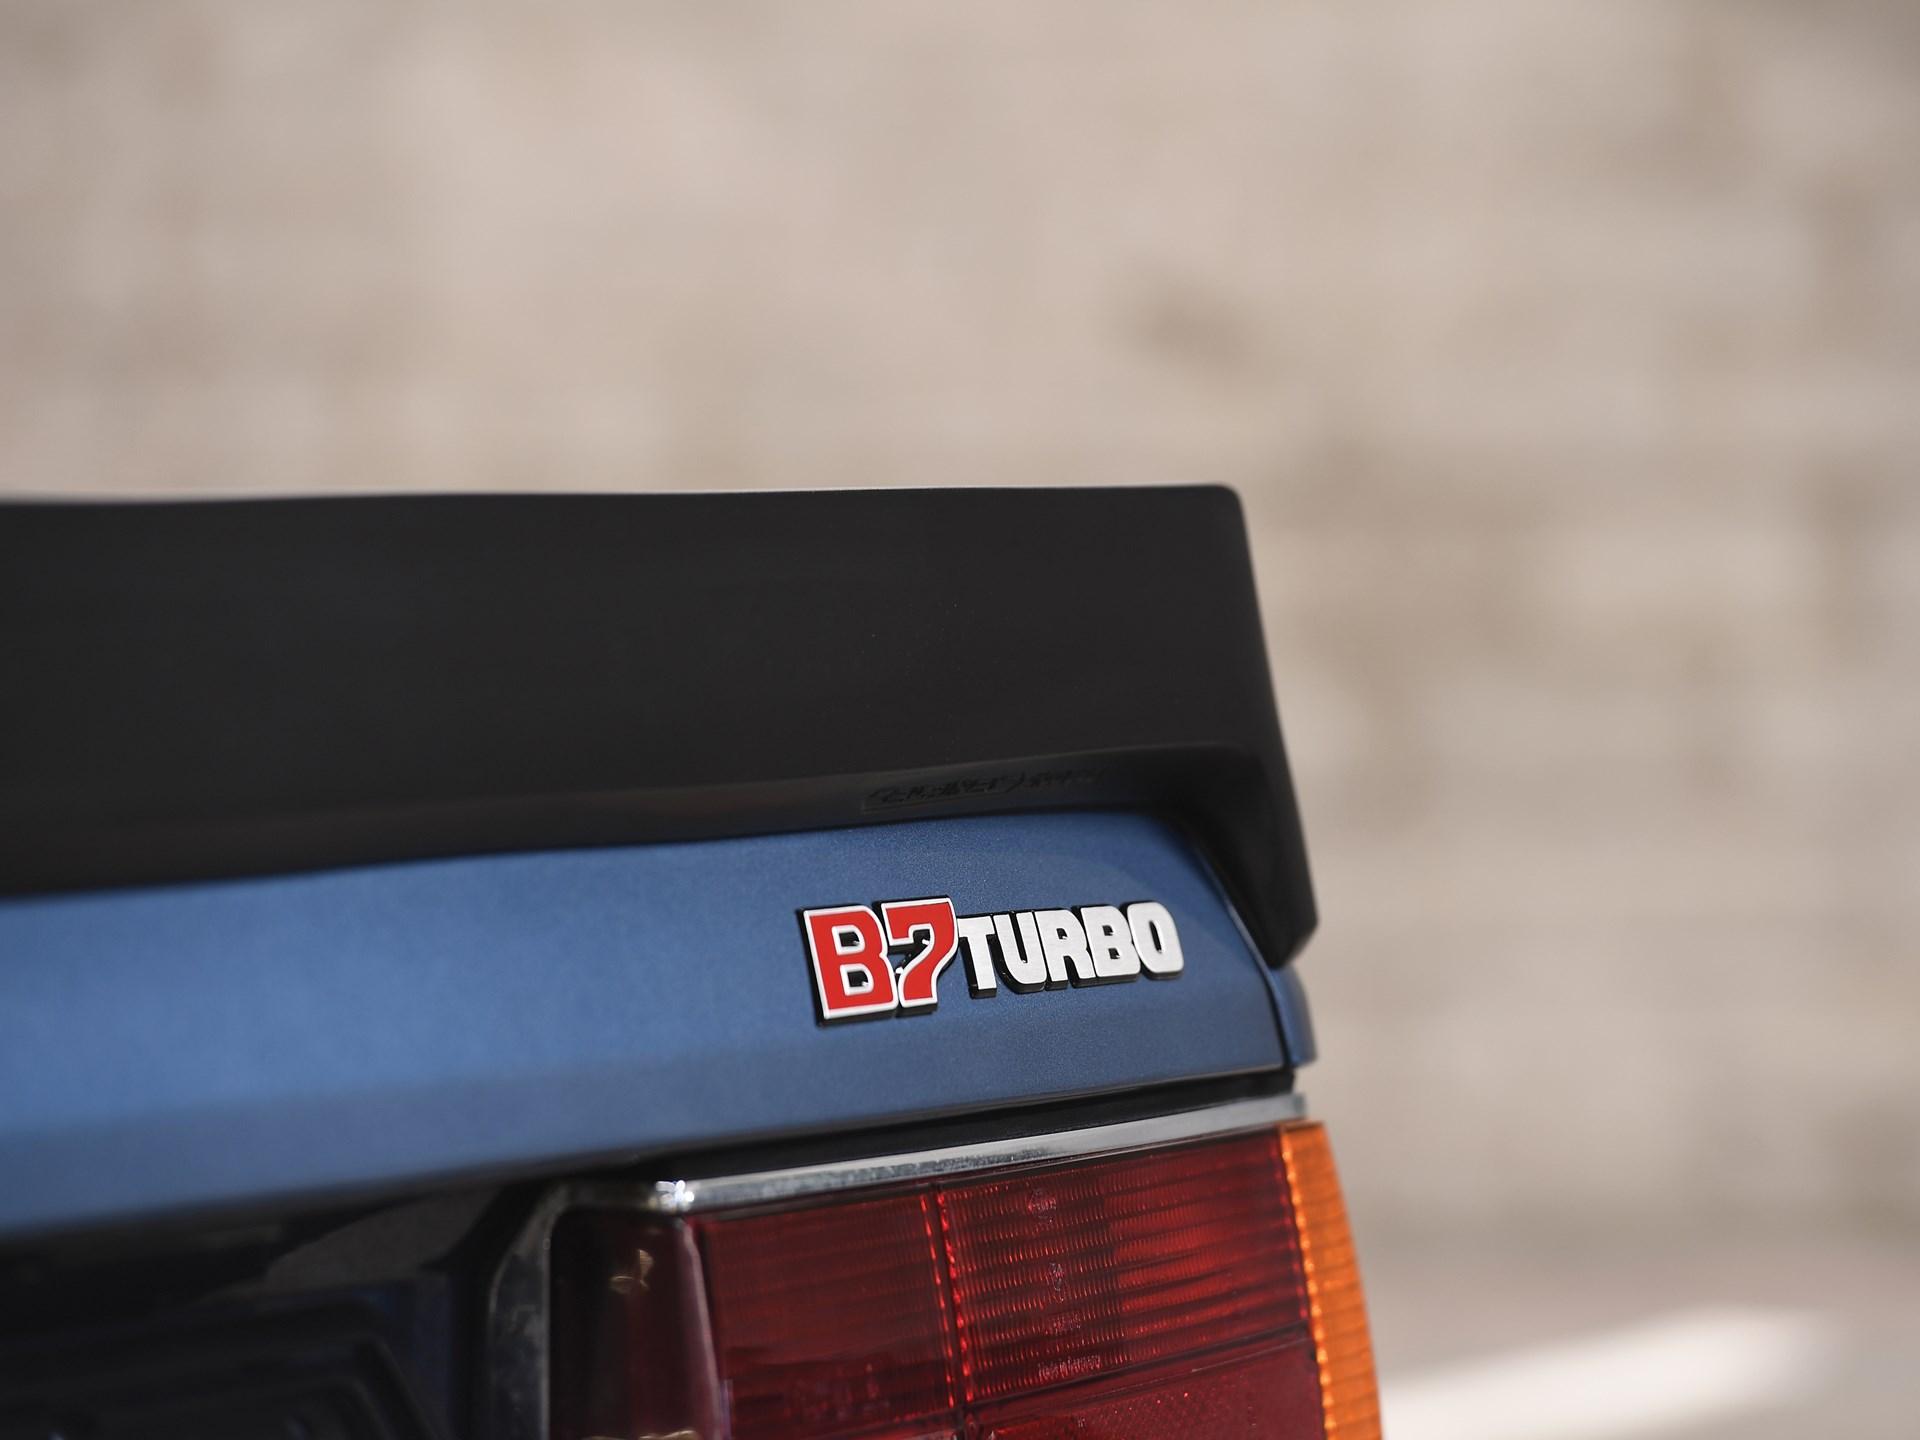 1985 BMW Alpina B7 Turbo Coupé